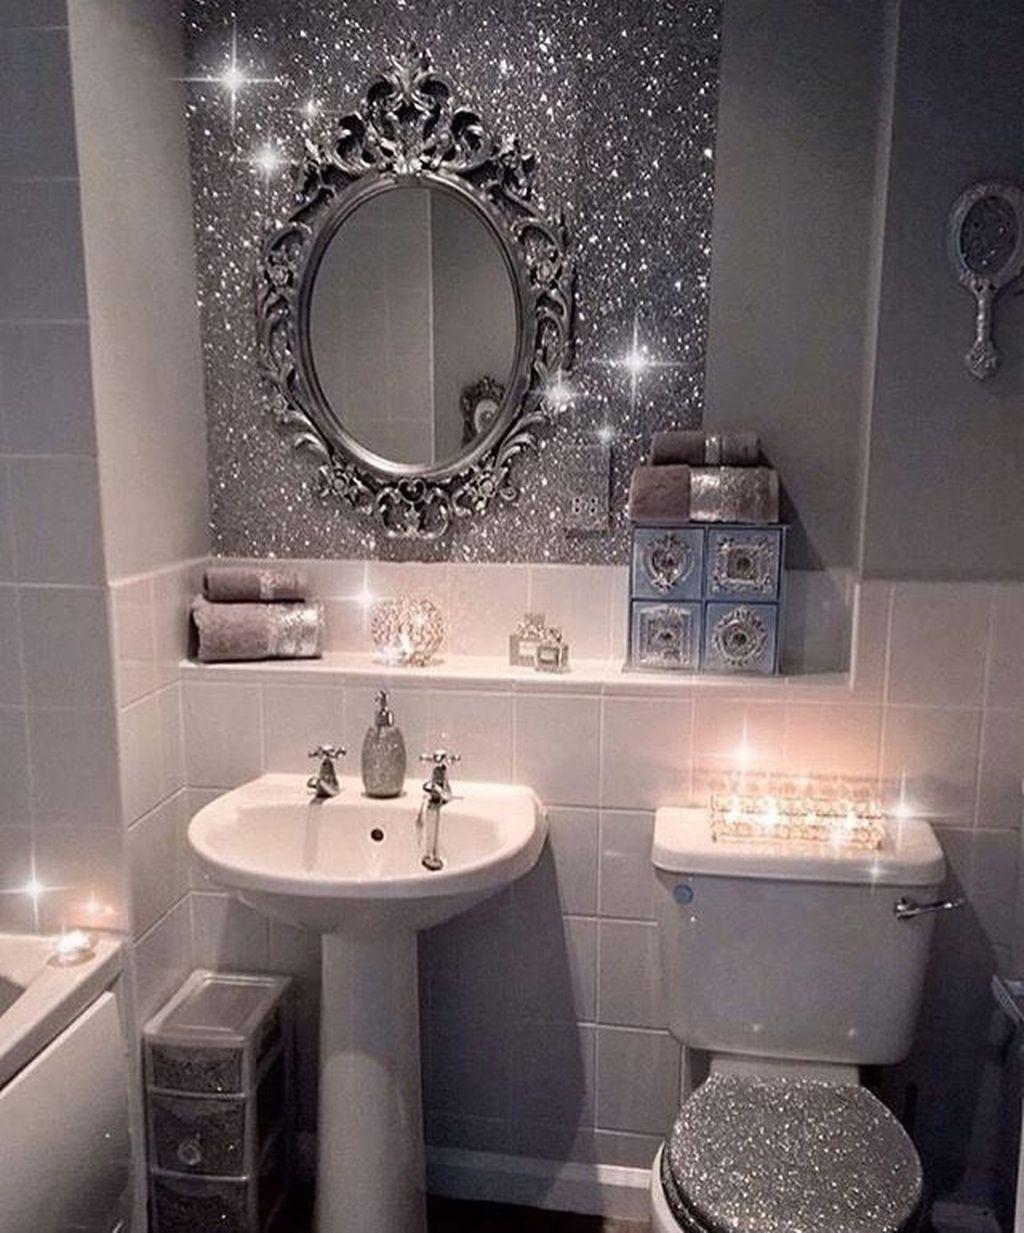 Badezimmer Dekor, Classy Bathroom Decor